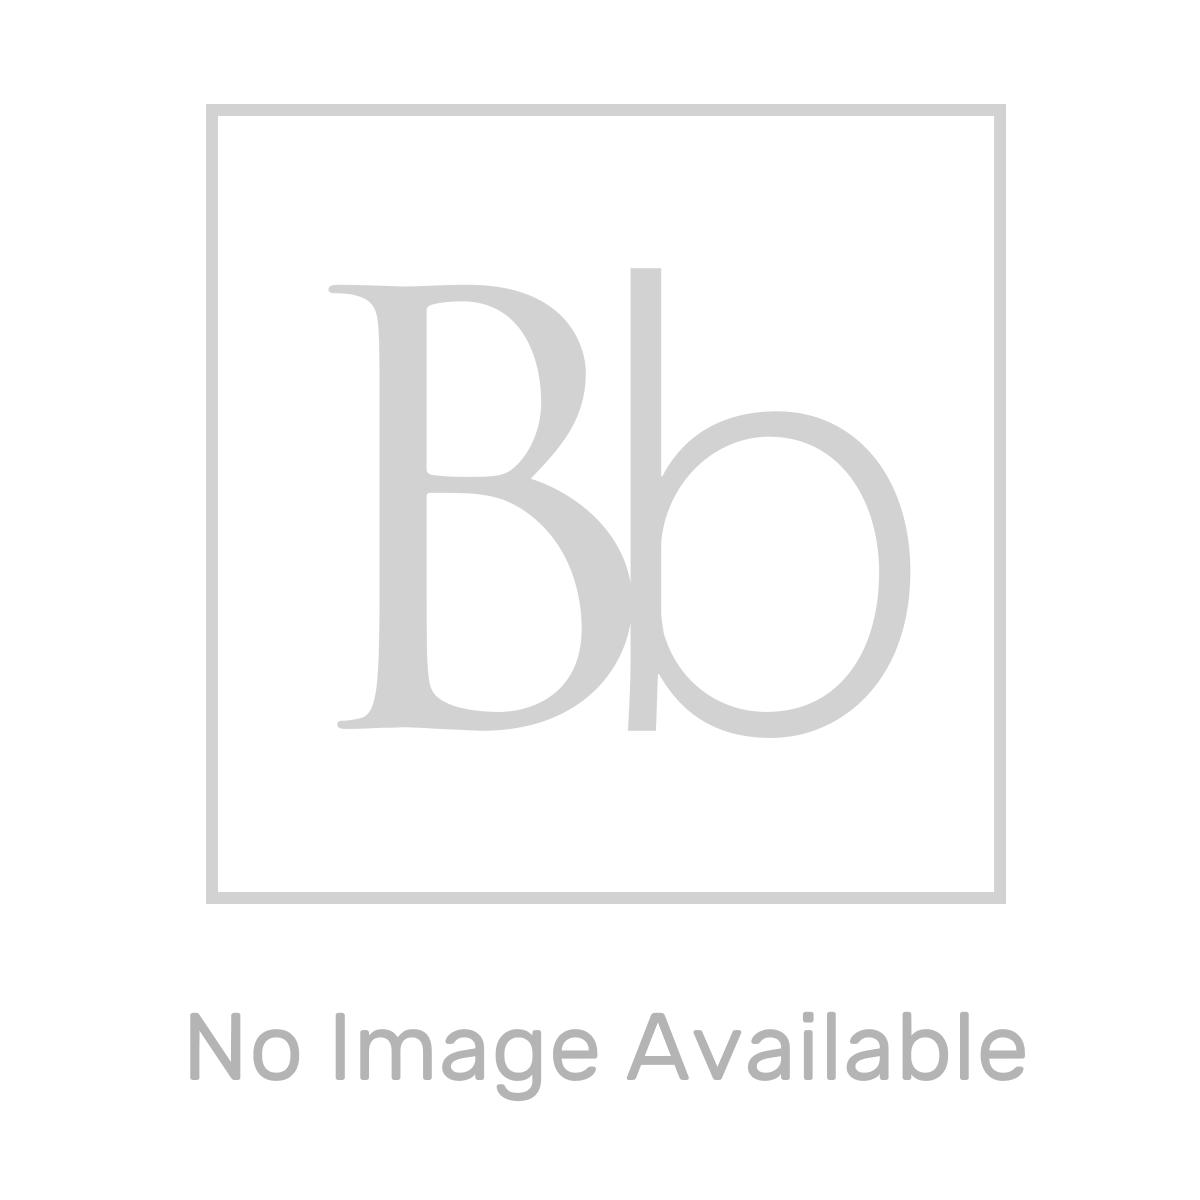 Kartell Astley Matt Grey Front Bath Panel 1700mm Lifestyle